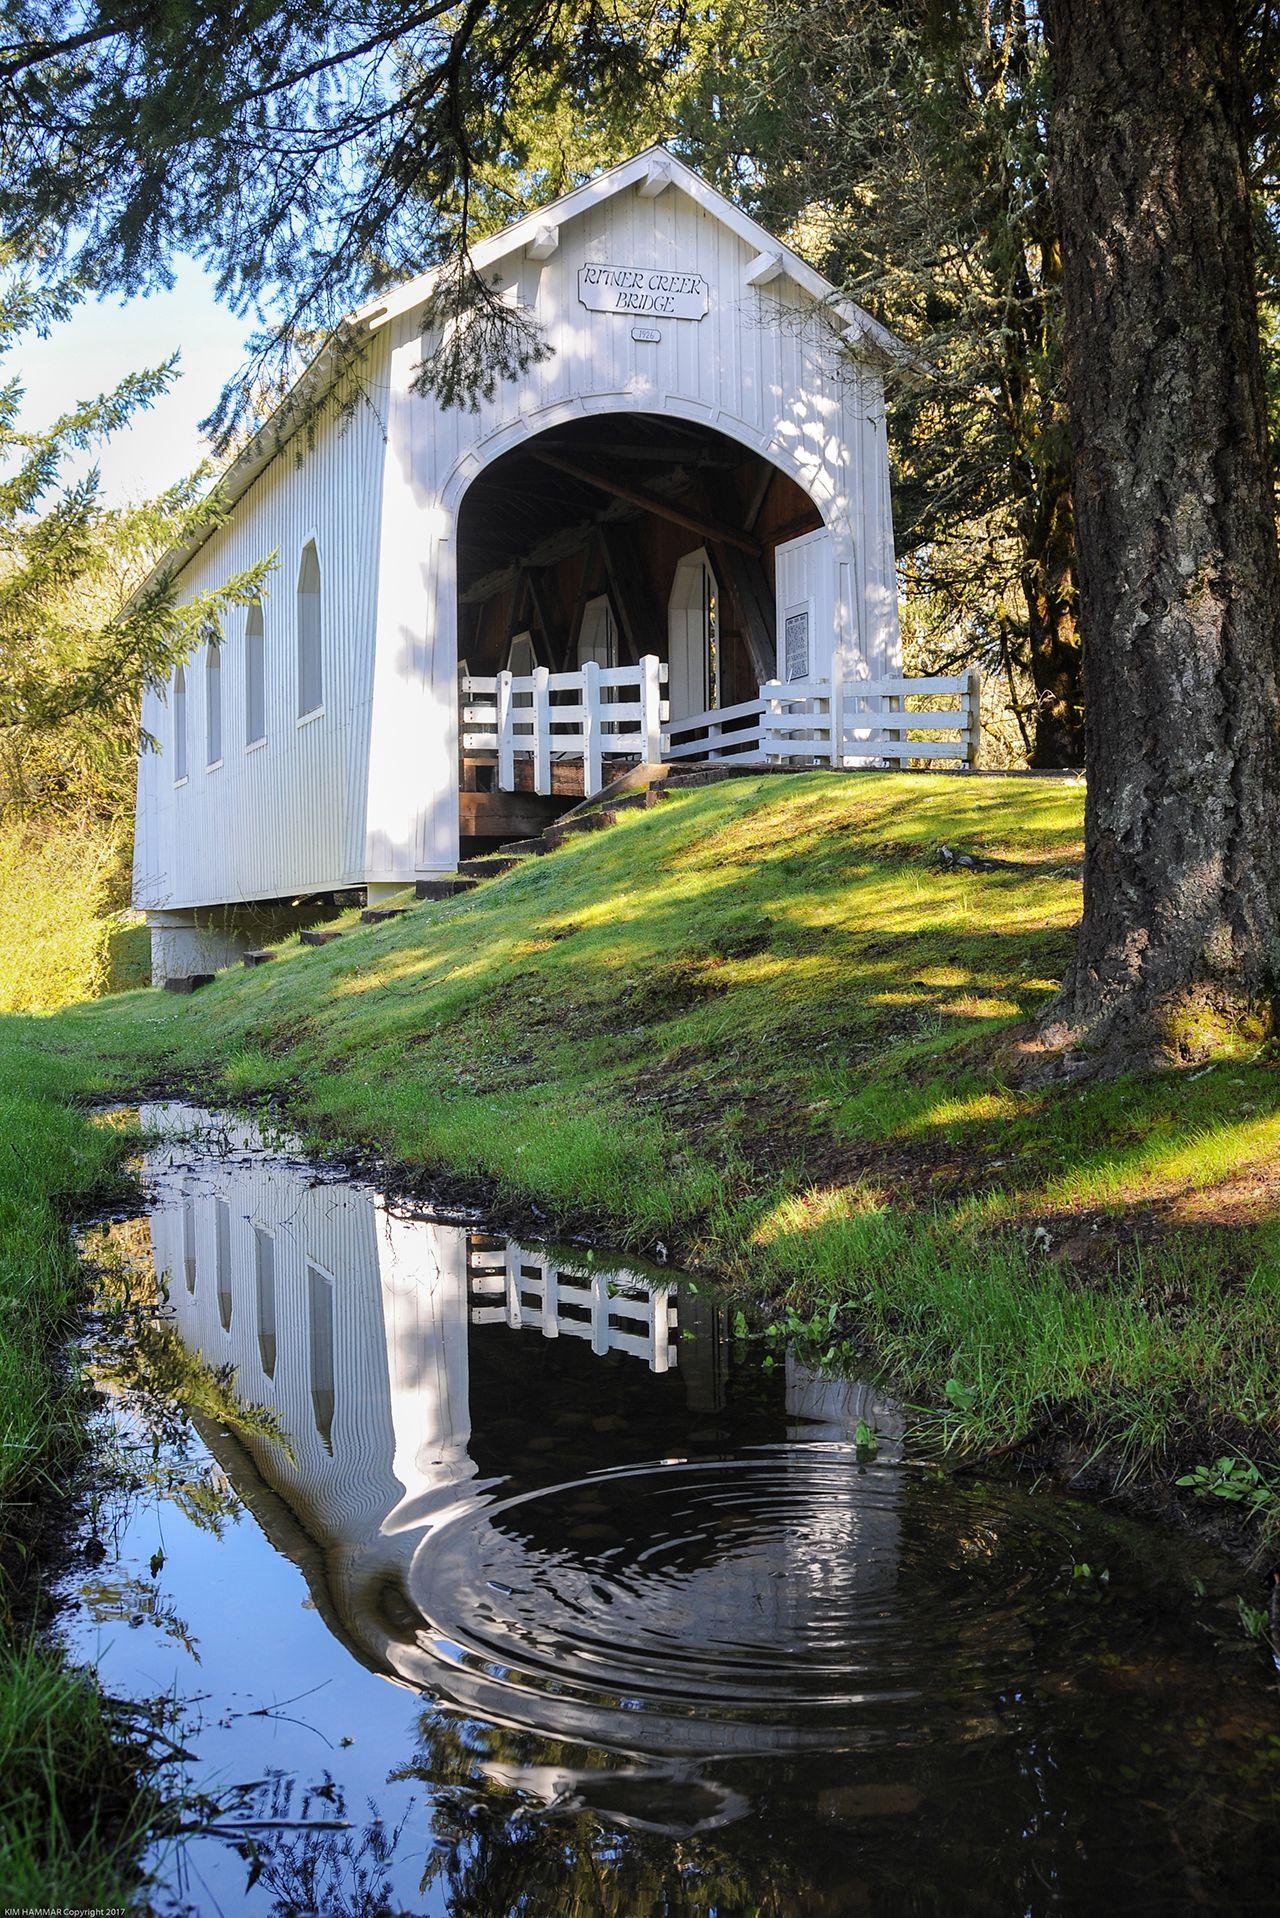 Reflection of Ritner Creek Covered Bridge